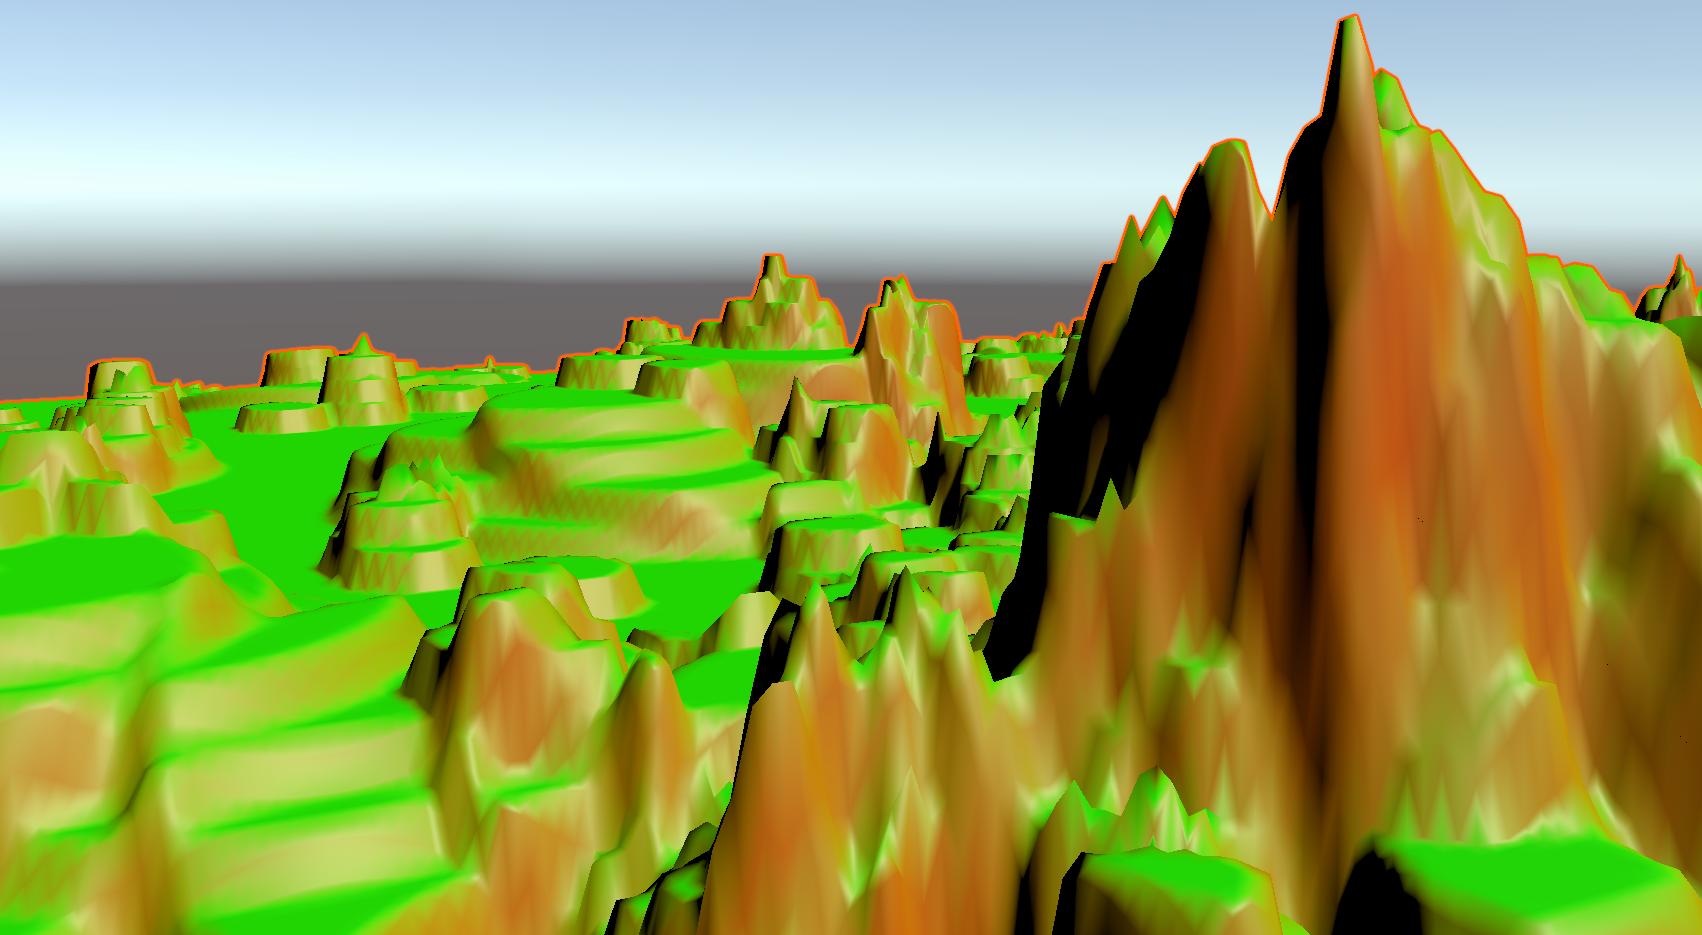 20210423_terrain_steepness.png